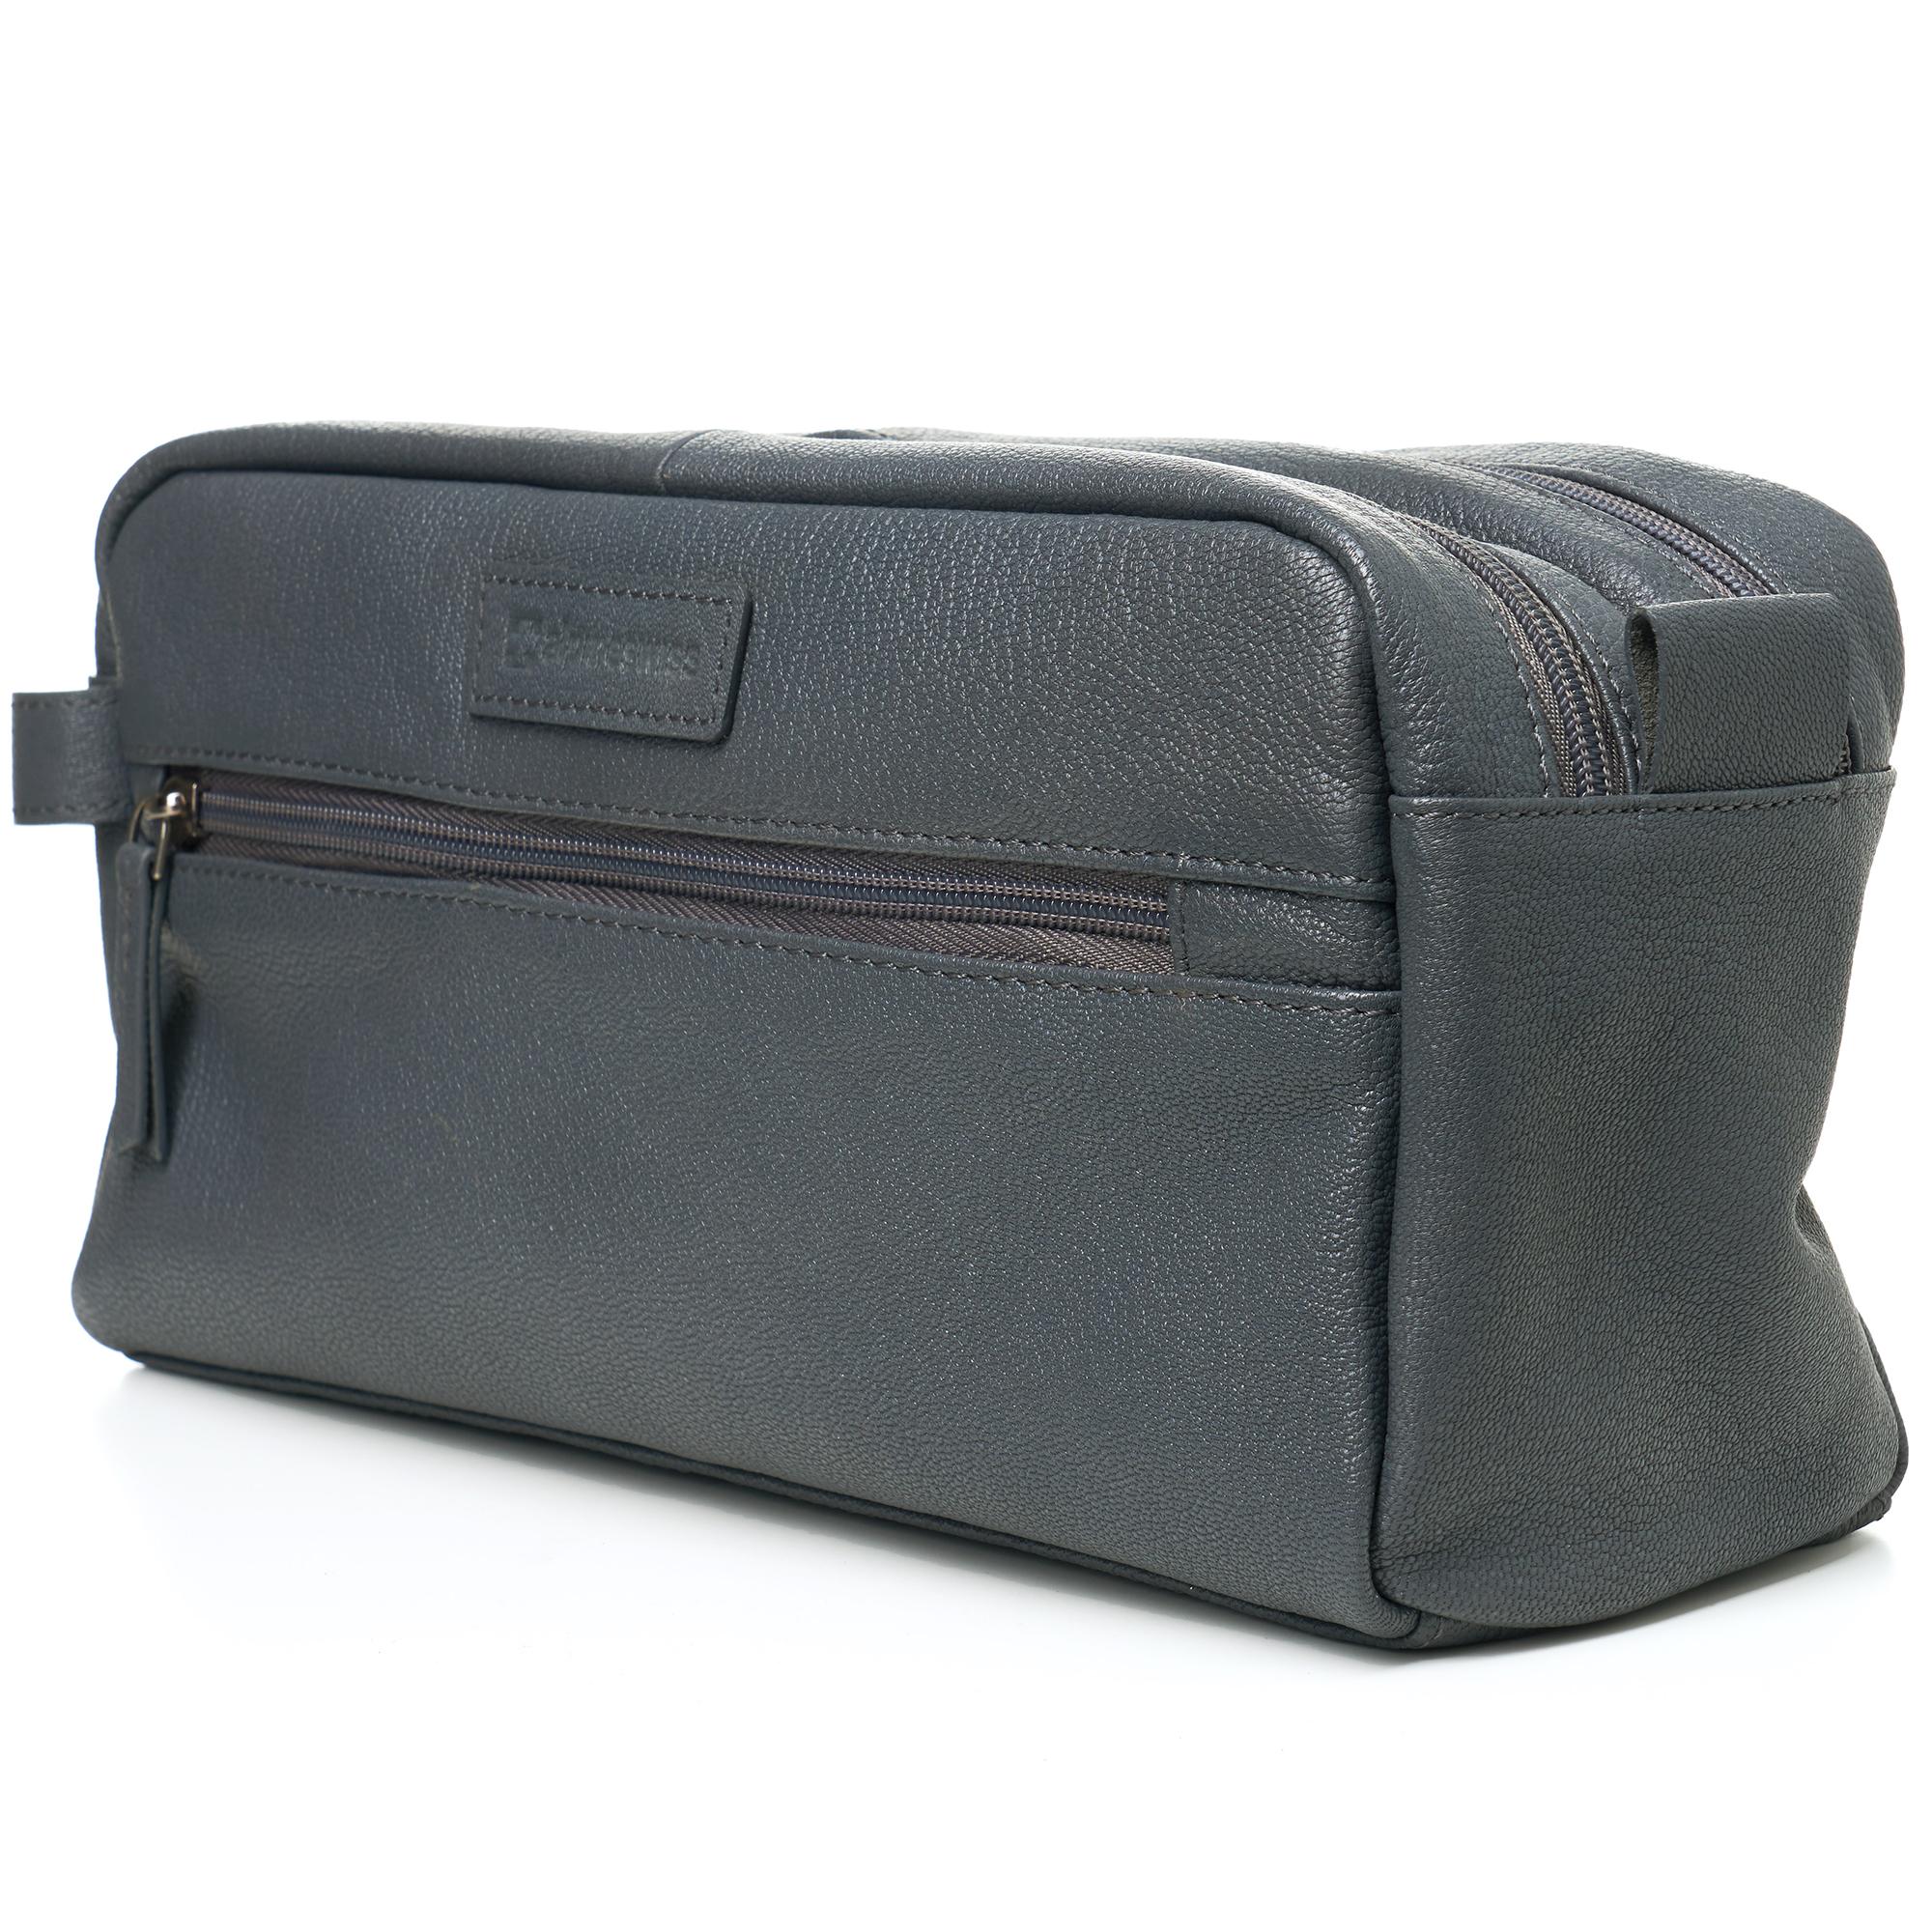 AlpineSwiss-Sedona-Toiletry-Bag-Genuine-Leather-Shaving-Kit-Dopp-Kit-Travel-Case thumbnail 28